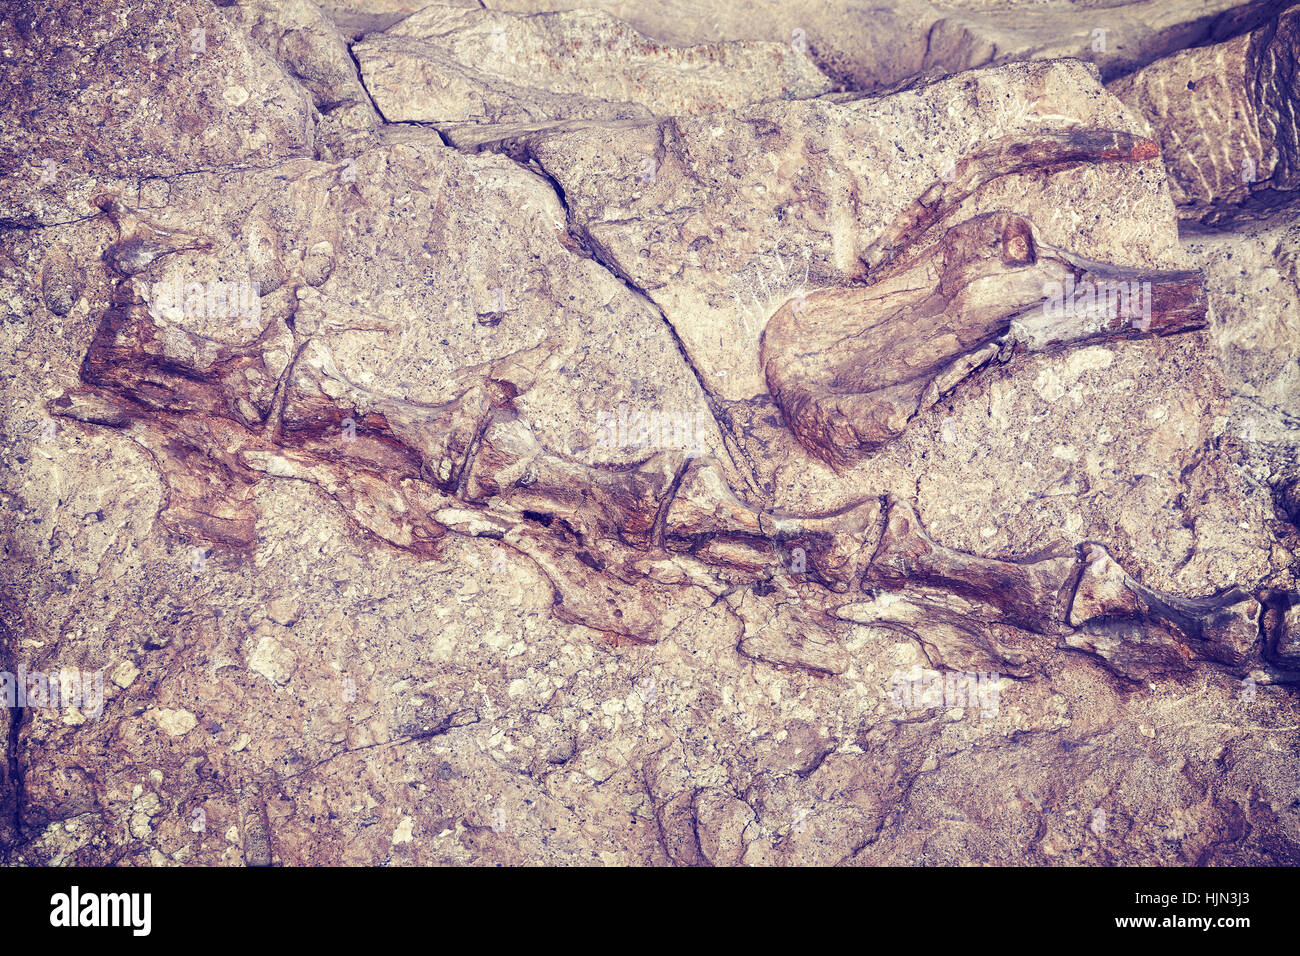 Color toned dinosaur skeleton in Dinosaur National Monument, Utah, USA. - Stock Image